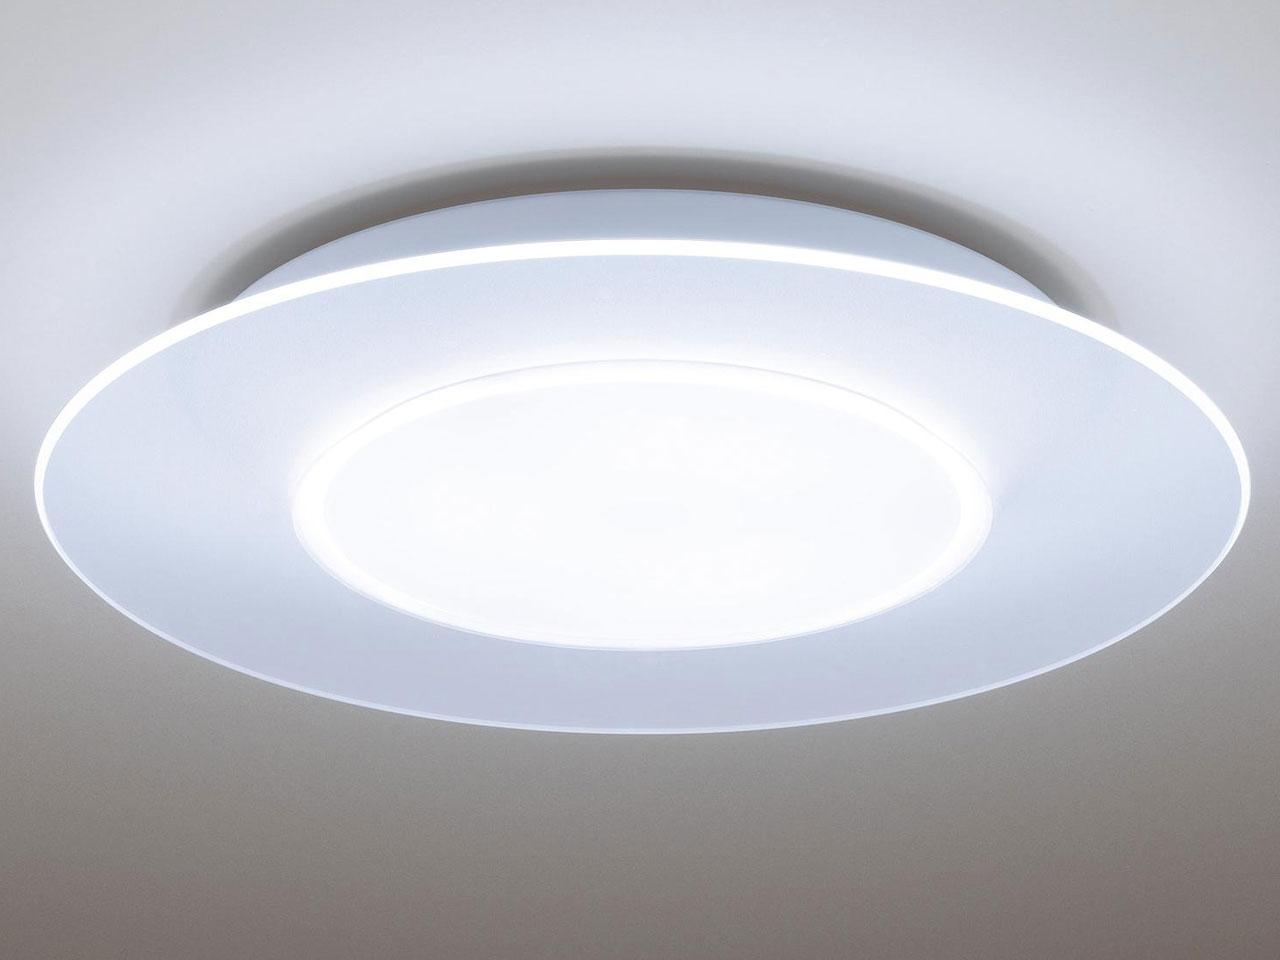 Panasonic パナソニック【HH-CE1080A】 HHCE1080A LEDシーリングライト リモコン付 ~10畳用 調光・調色 【KK9N0D18P】